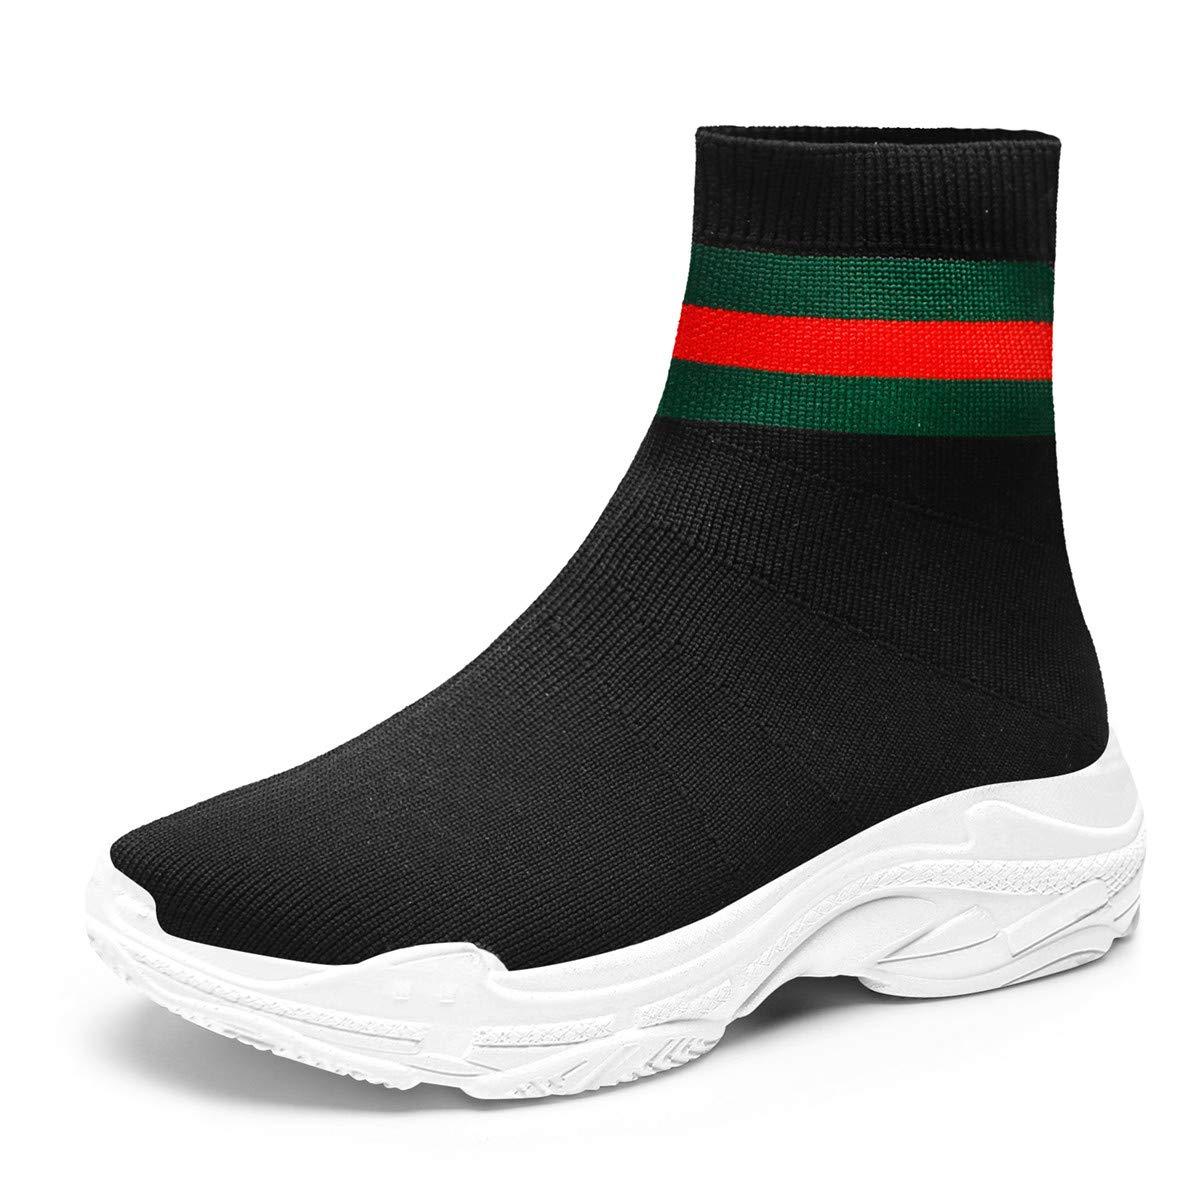 Hommes athlétique Femmes Mode Sneakers athlétique B07GRN261M Baskets Respirant Respirant Chaussures Blanc 0591acd - boatplans.space